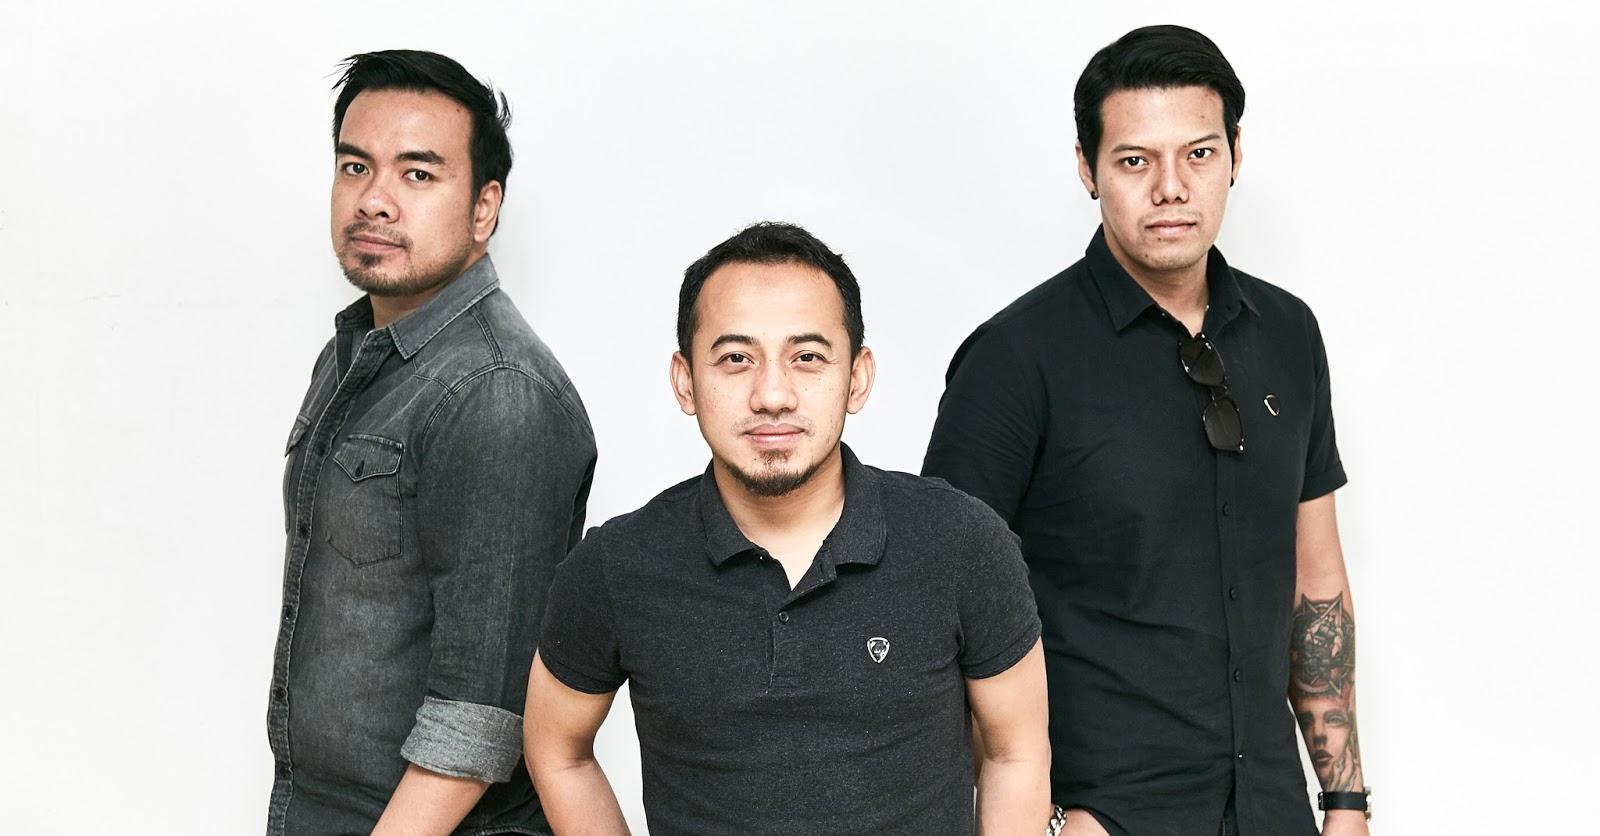 Download [Mp3]-[All Hit Album] รวมเพลงจากทุกอัลบั้มของ ลาบานูน (Labanoon) ทุกงานเพลง @320kbps 4shared By Pleng-mun.com